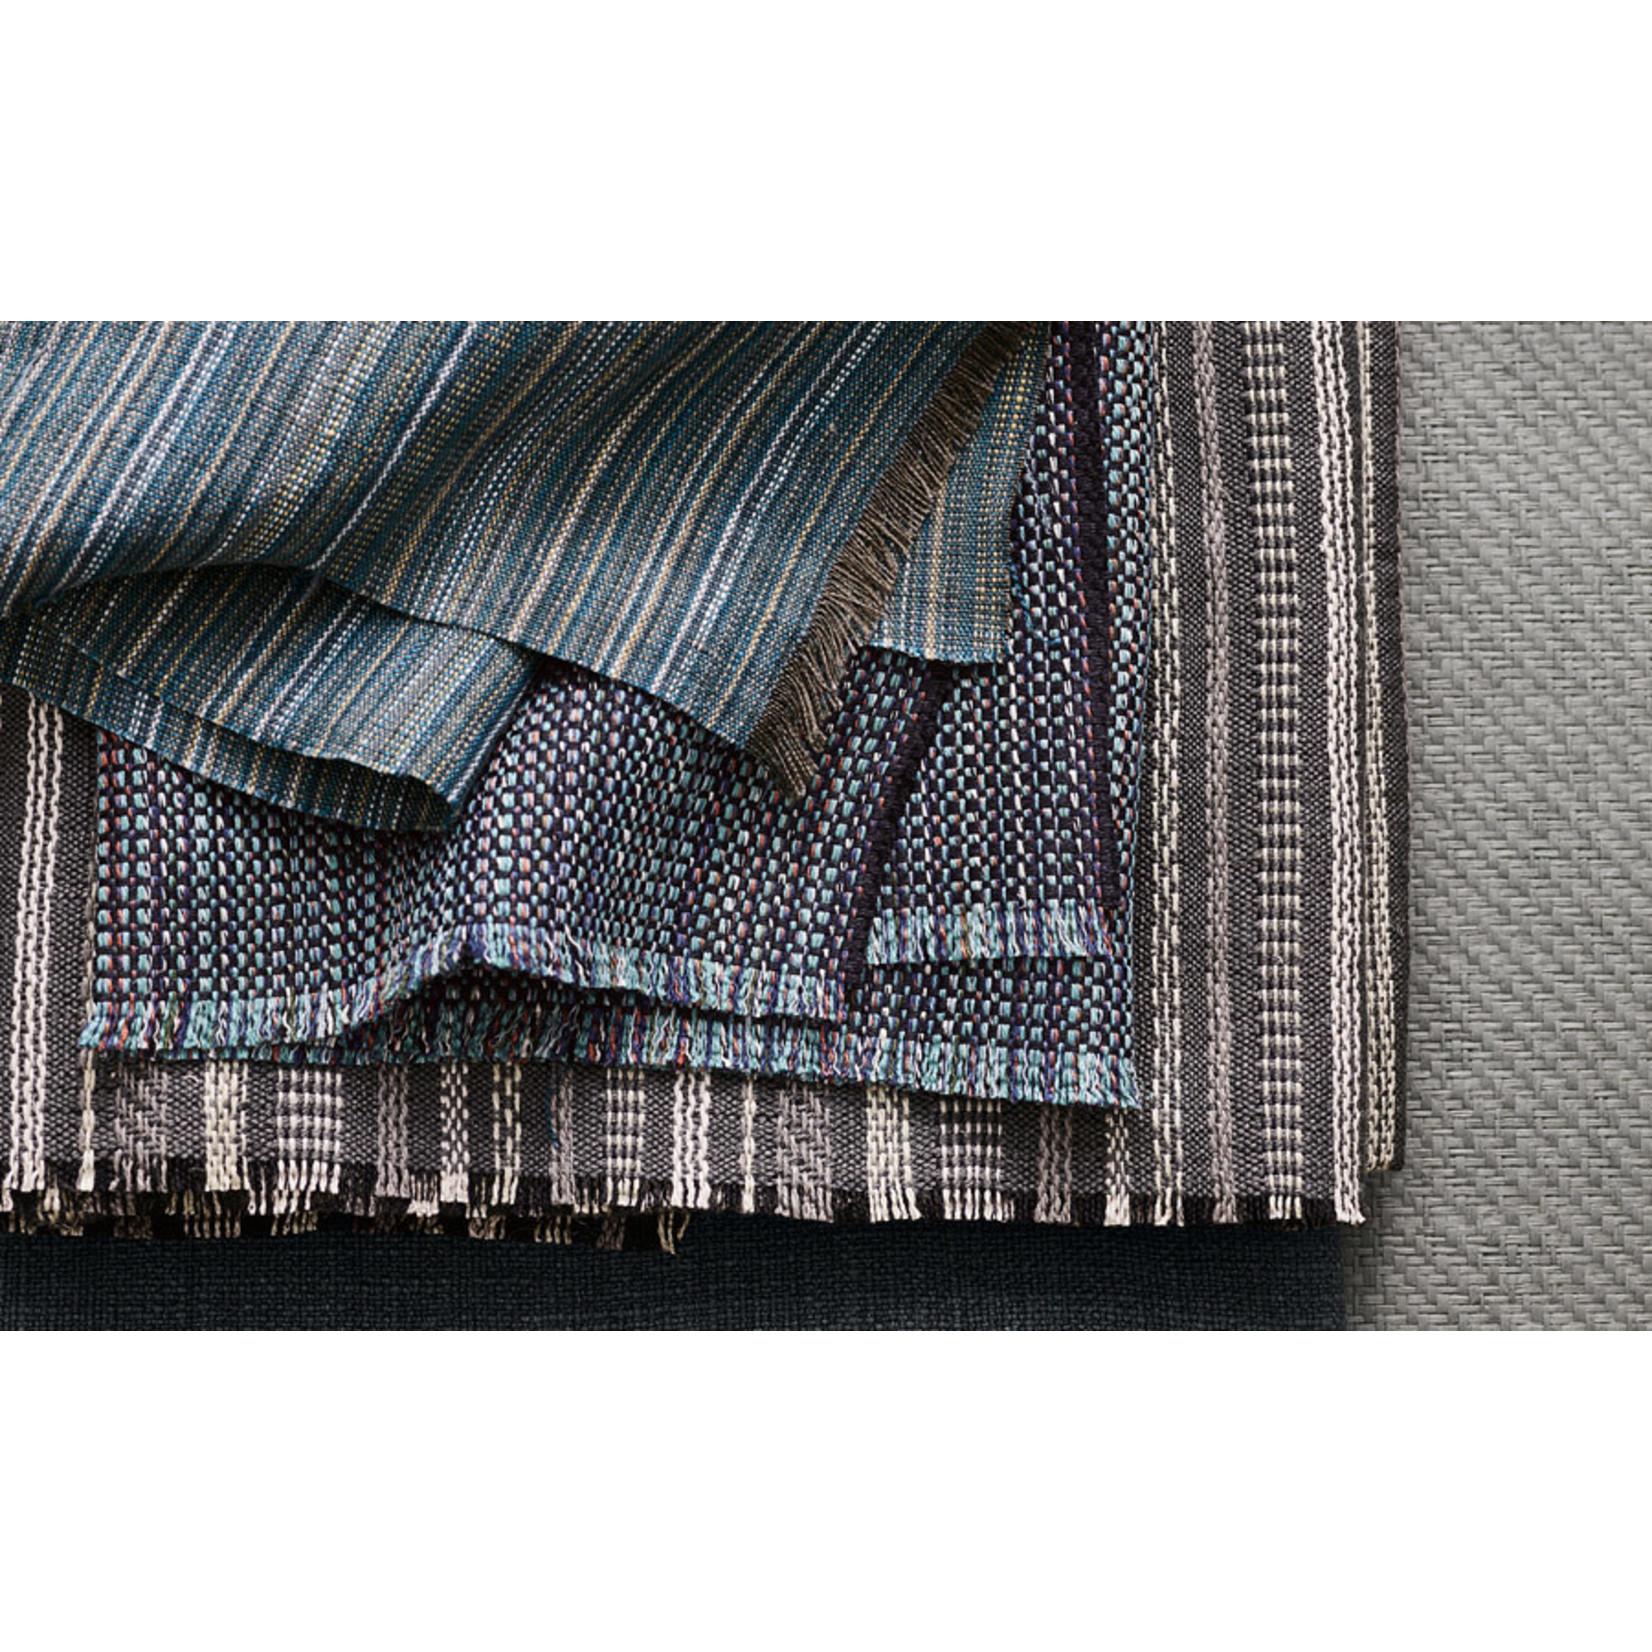 Mark Alexander Paperweave Handwoven Wallcoverings | Papier Heath